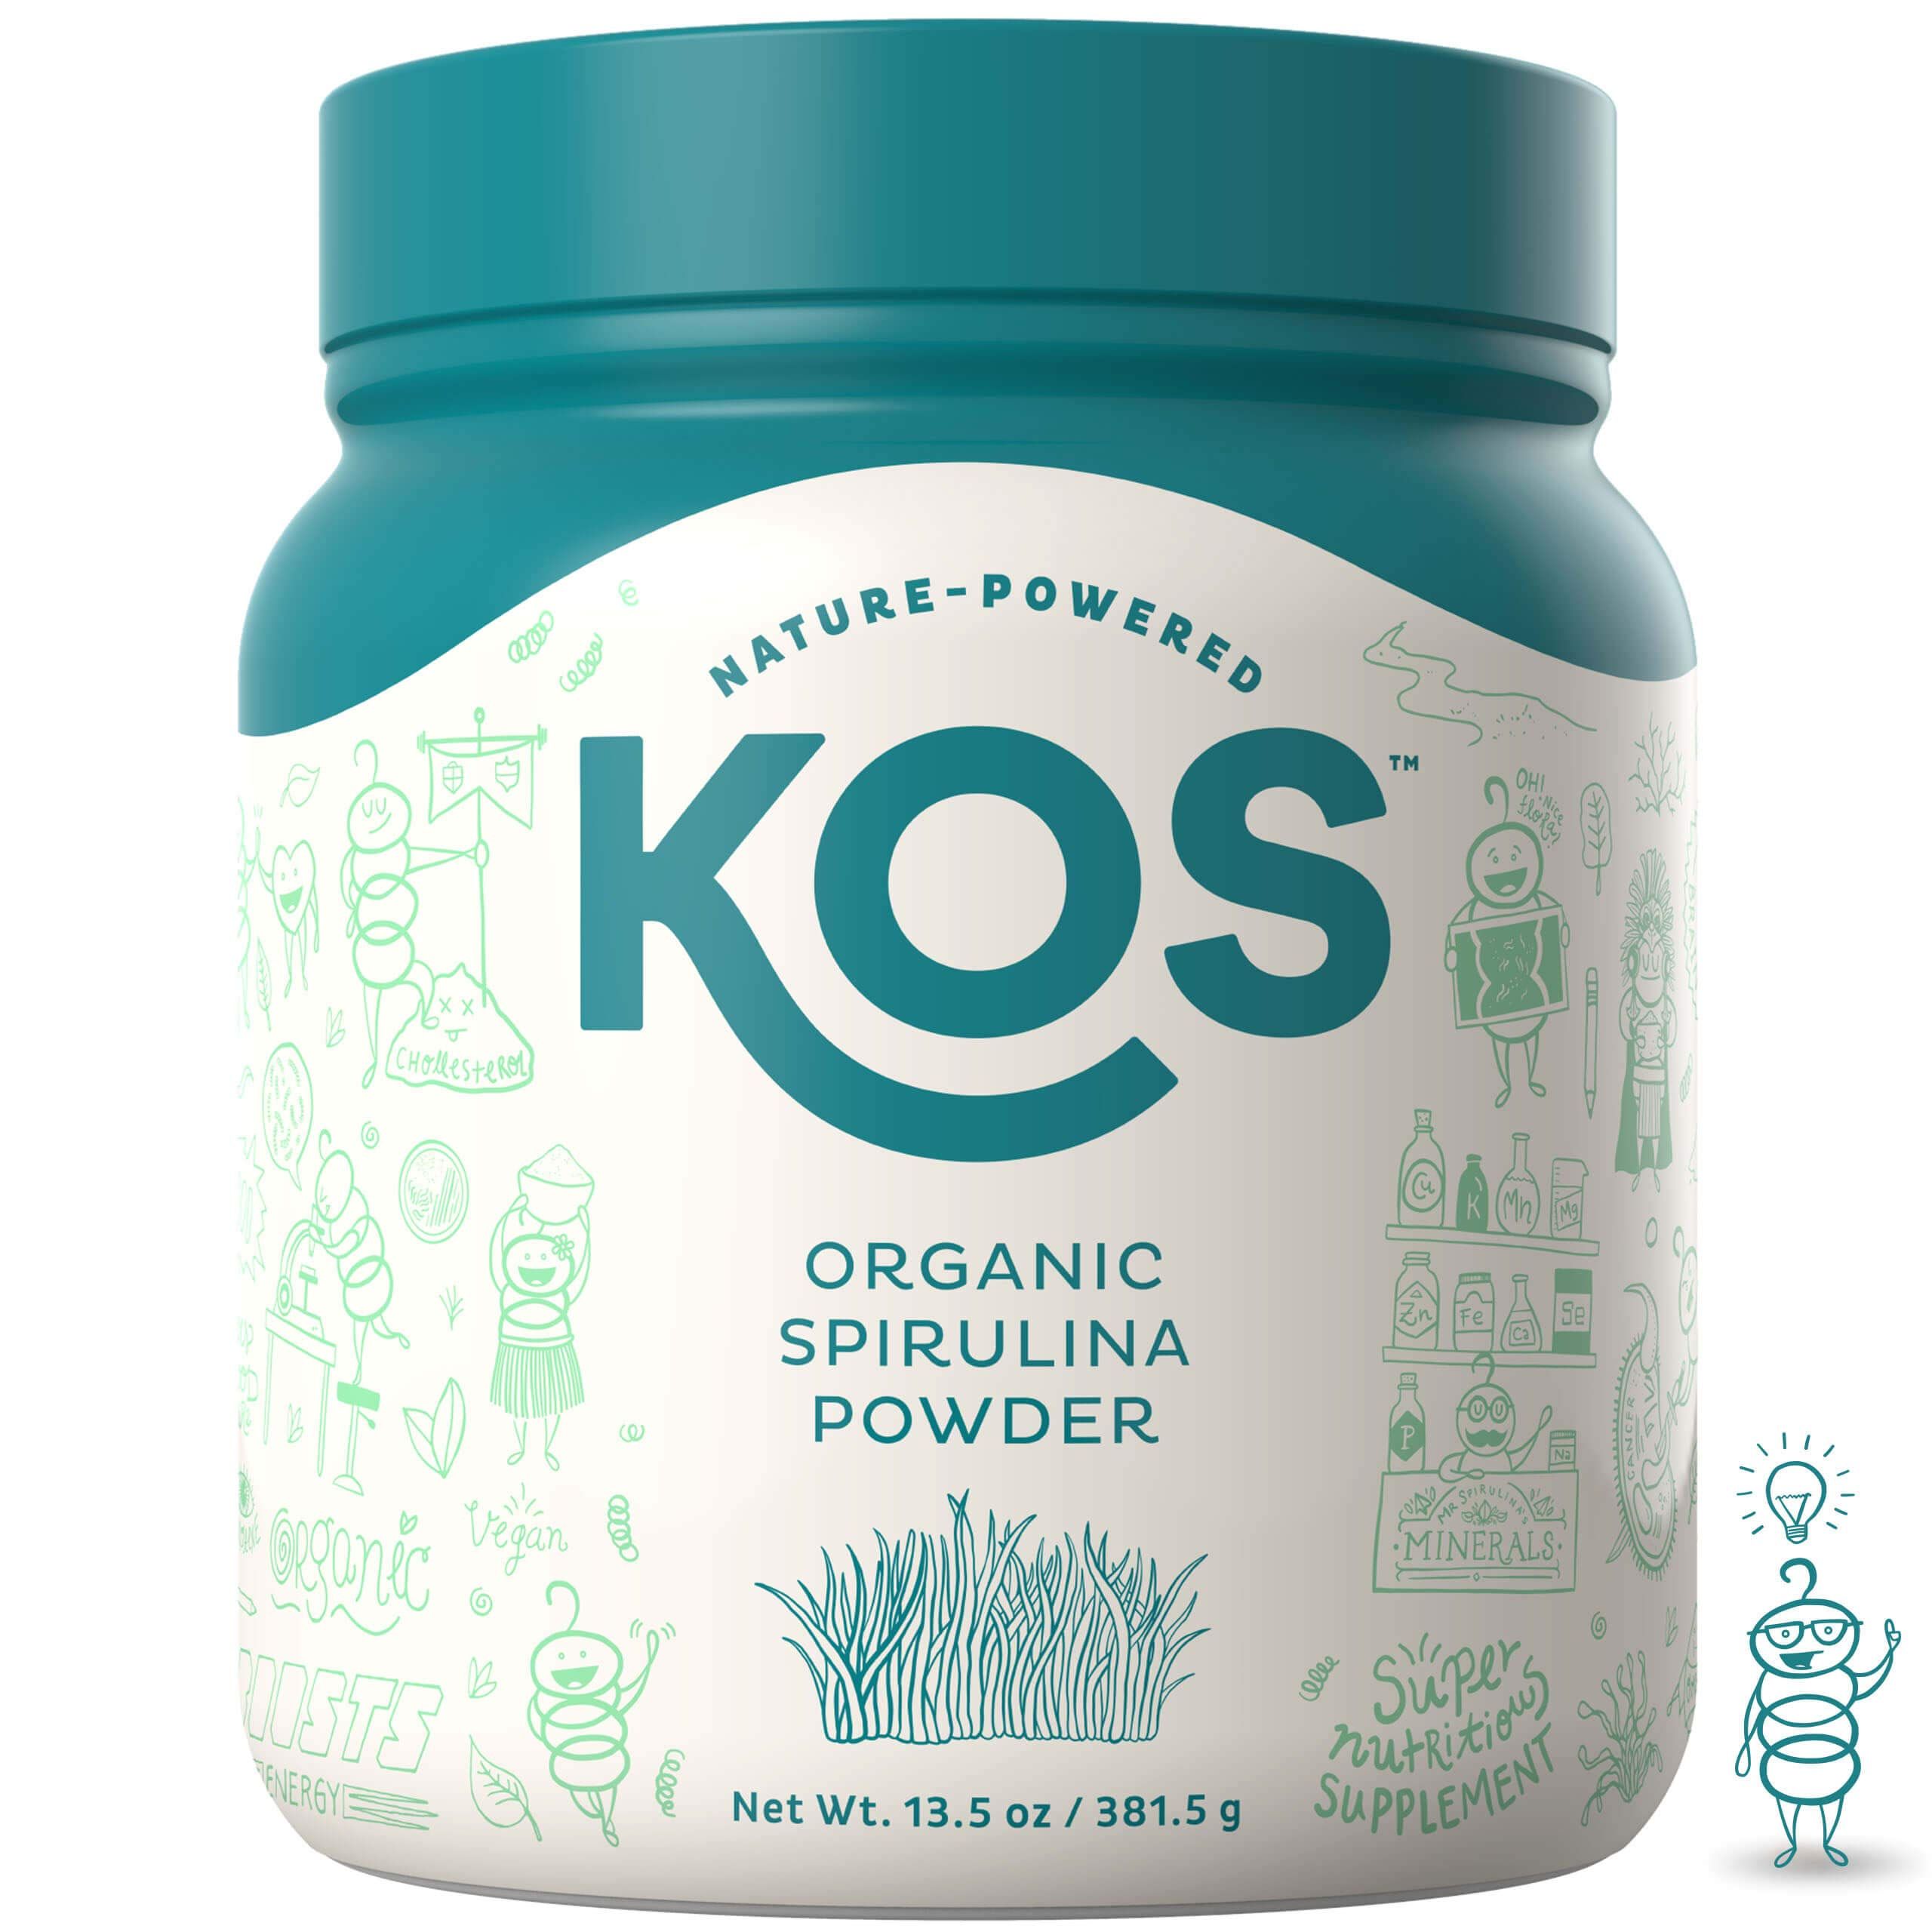 KOS Organic Spirulina Powder | Pure Non-Irradiated Blue Hawaiin Spirulina Powder | USDA Organic Immunity Enhancing Plant Based Superfood, 381g, 109 Servings